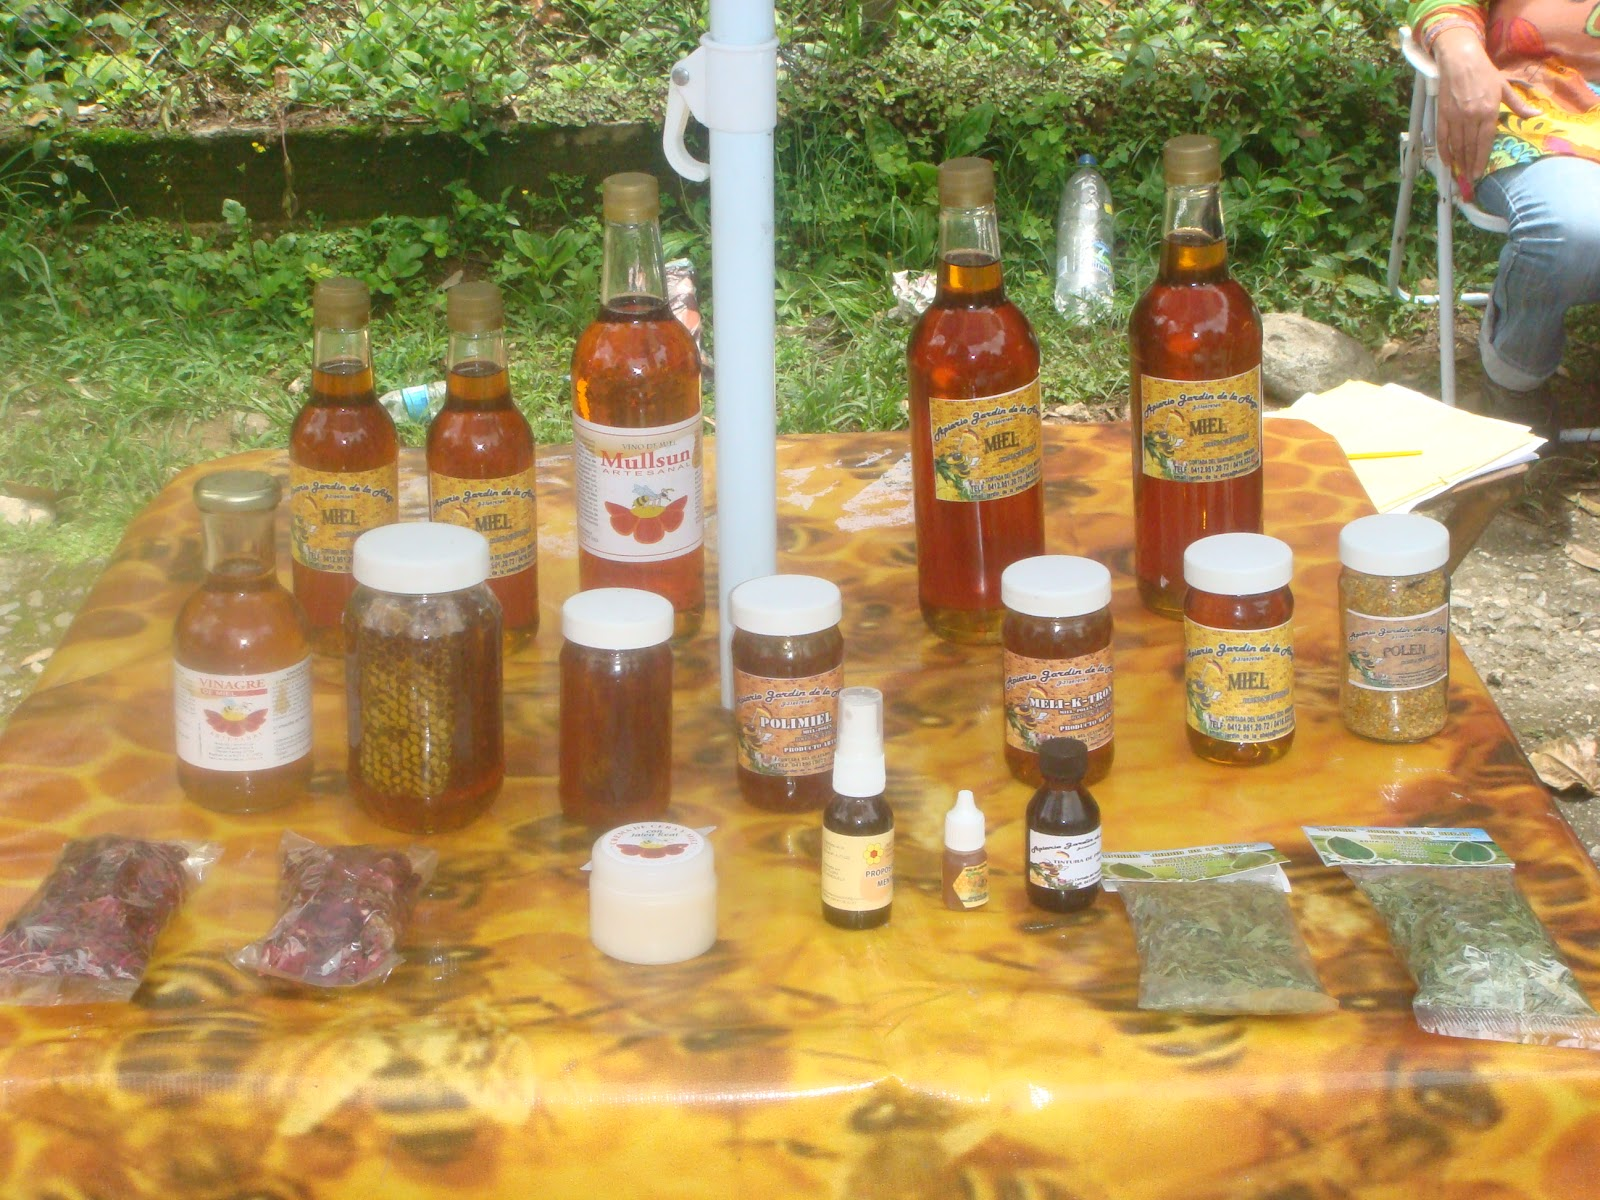 Apiario jardin de la abeja for Ahuyentar abejas jardin